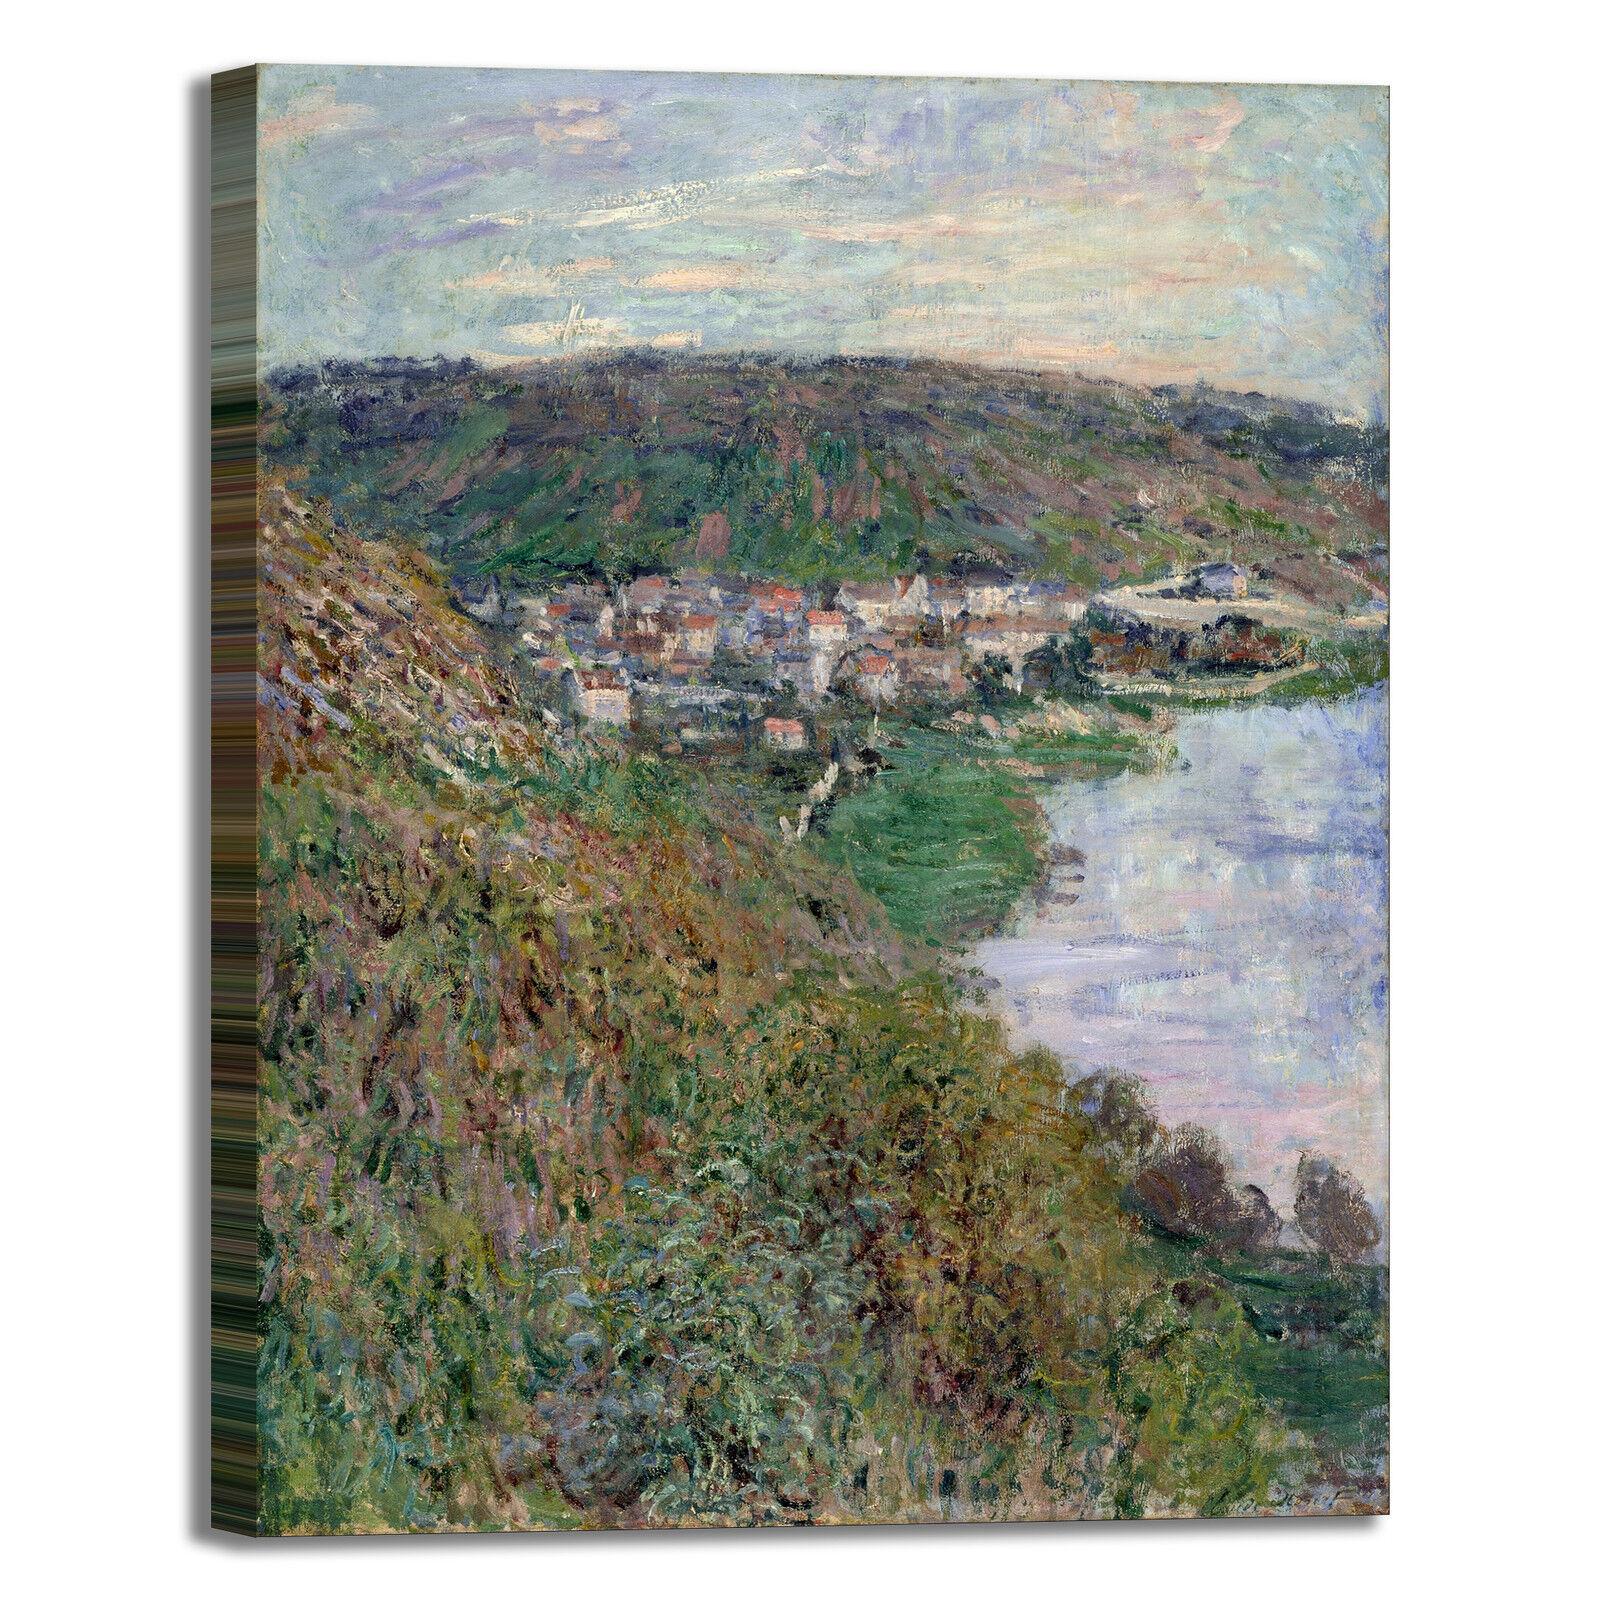 Monet veduta di Vétheuil design quadro stampa tela tela tela dipinto telaio arroto casa 35ba9b